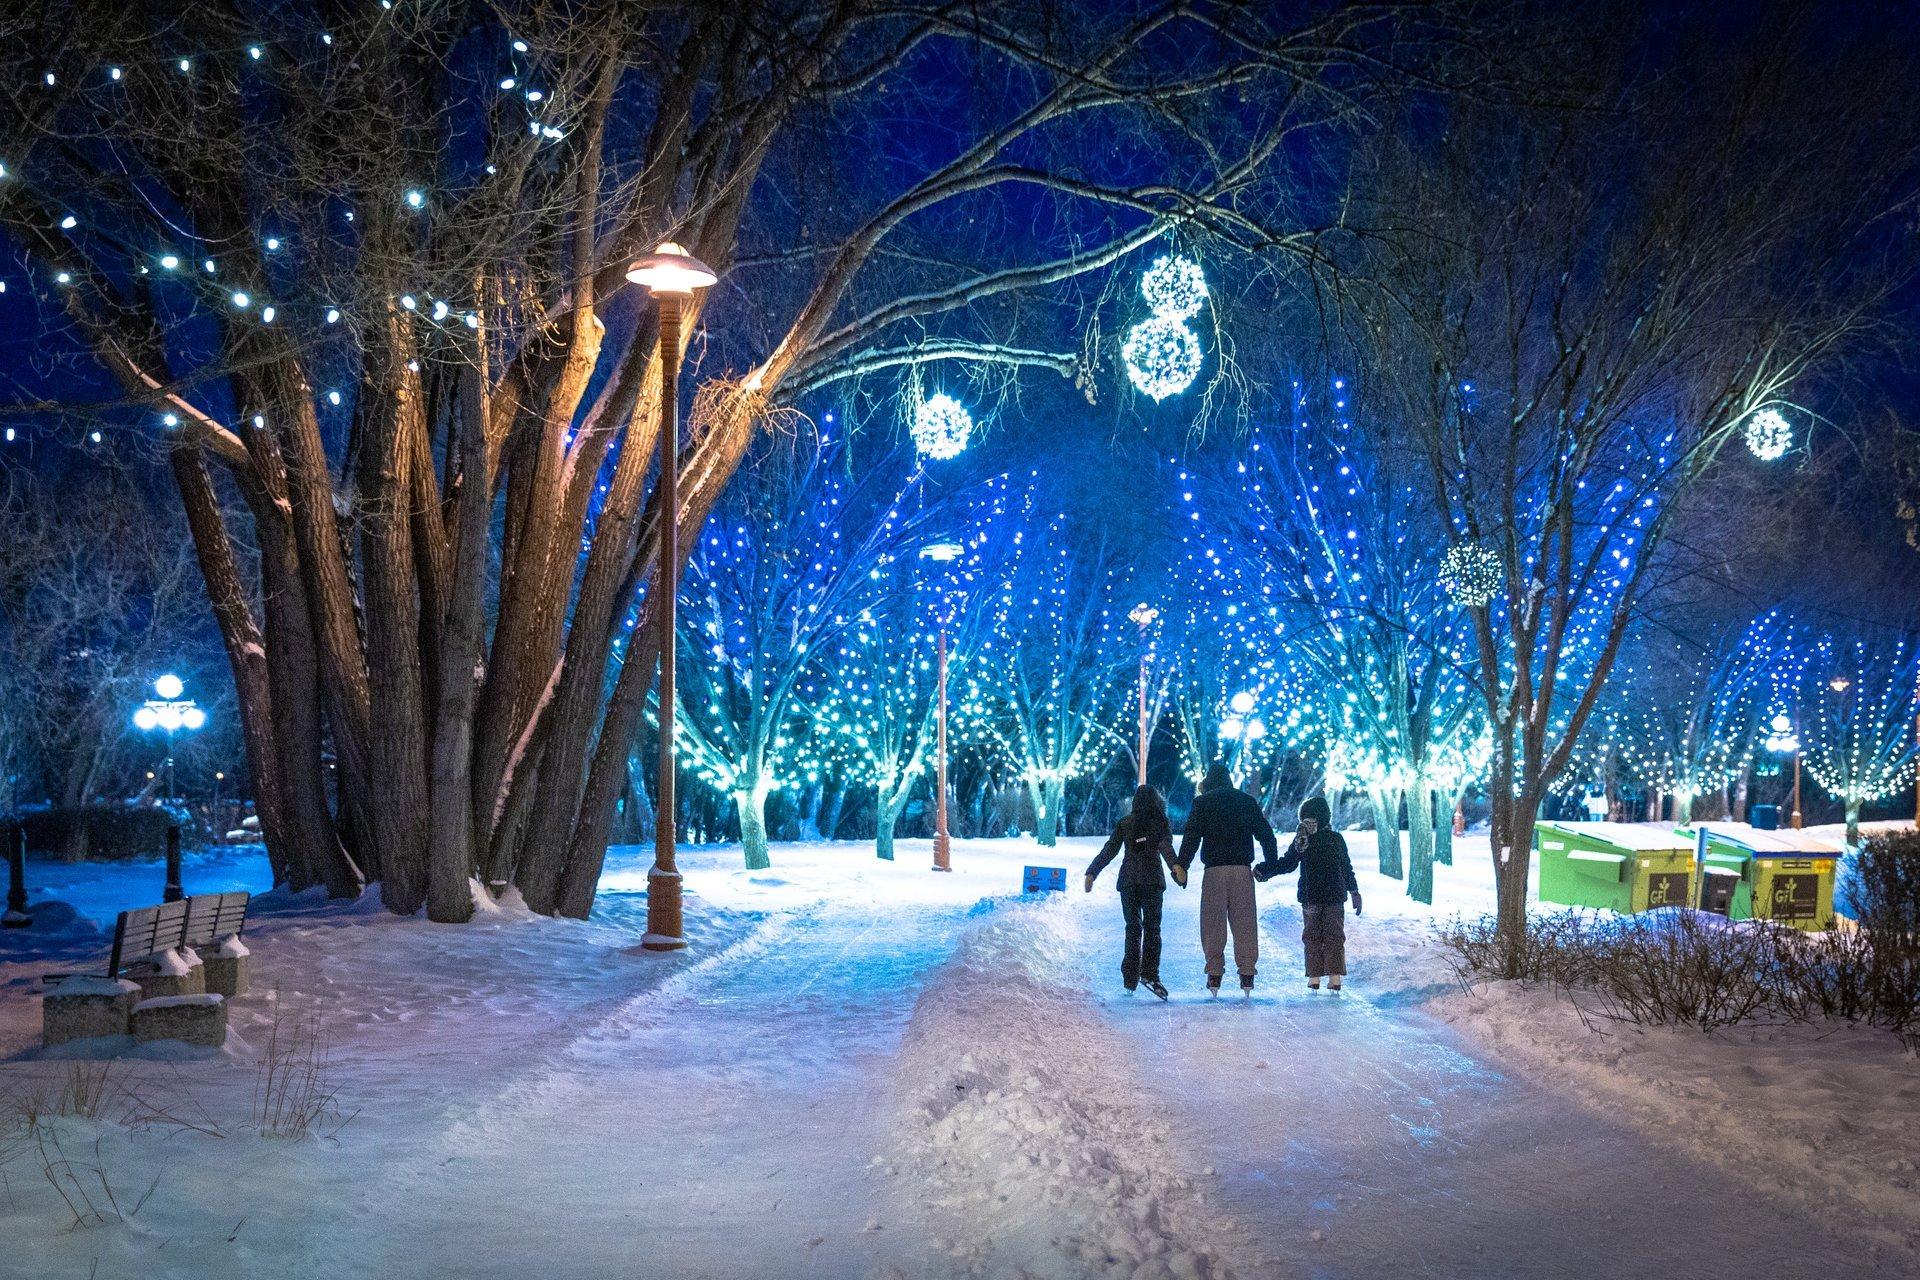 Christmas Lights in Winnipeg 2020 - Best Time